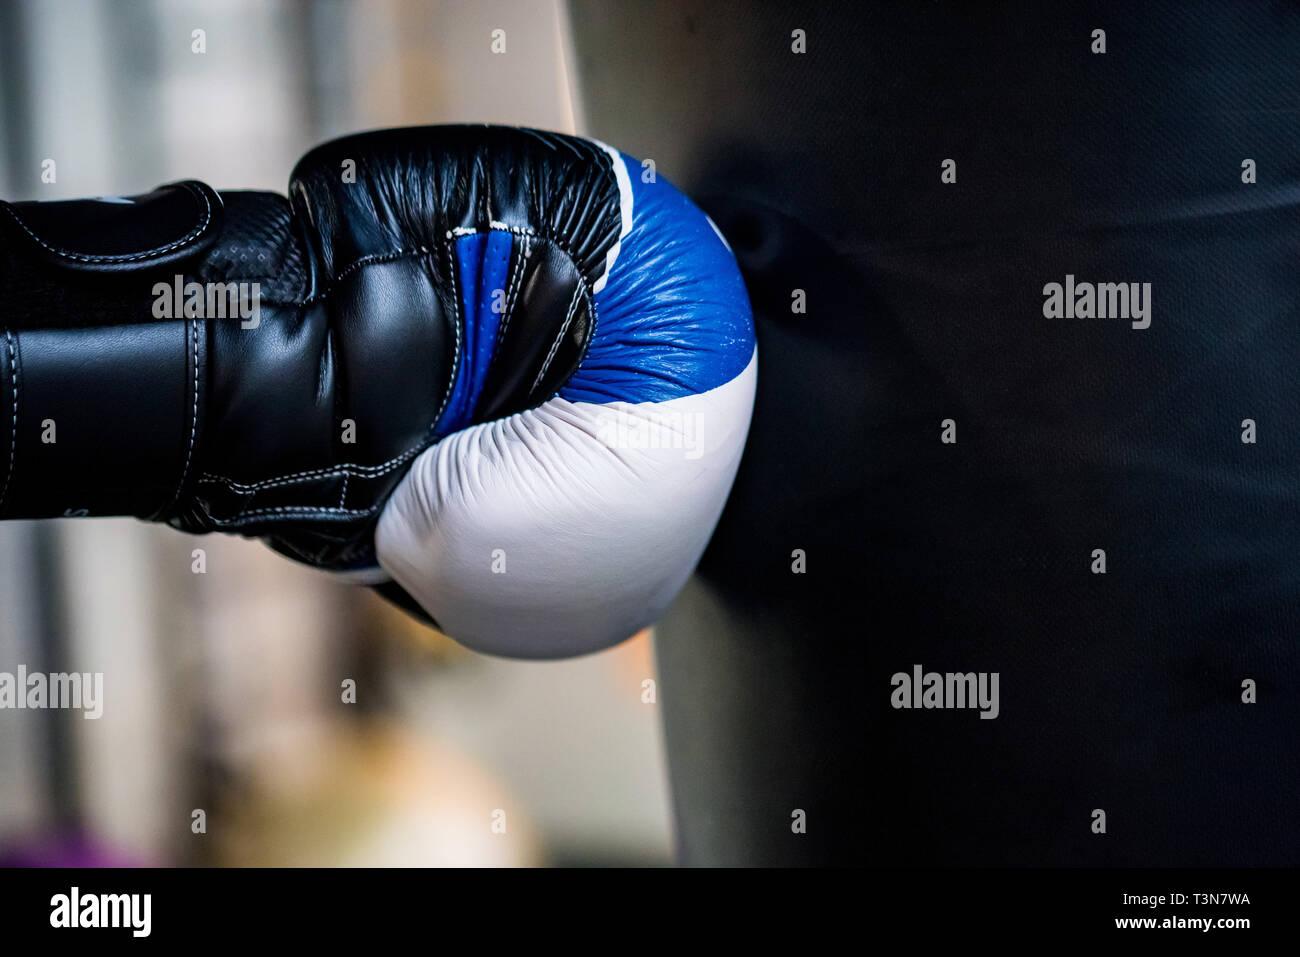 Boxing concept. Hand of boxer in glove hits black sandbag c Stock Photo